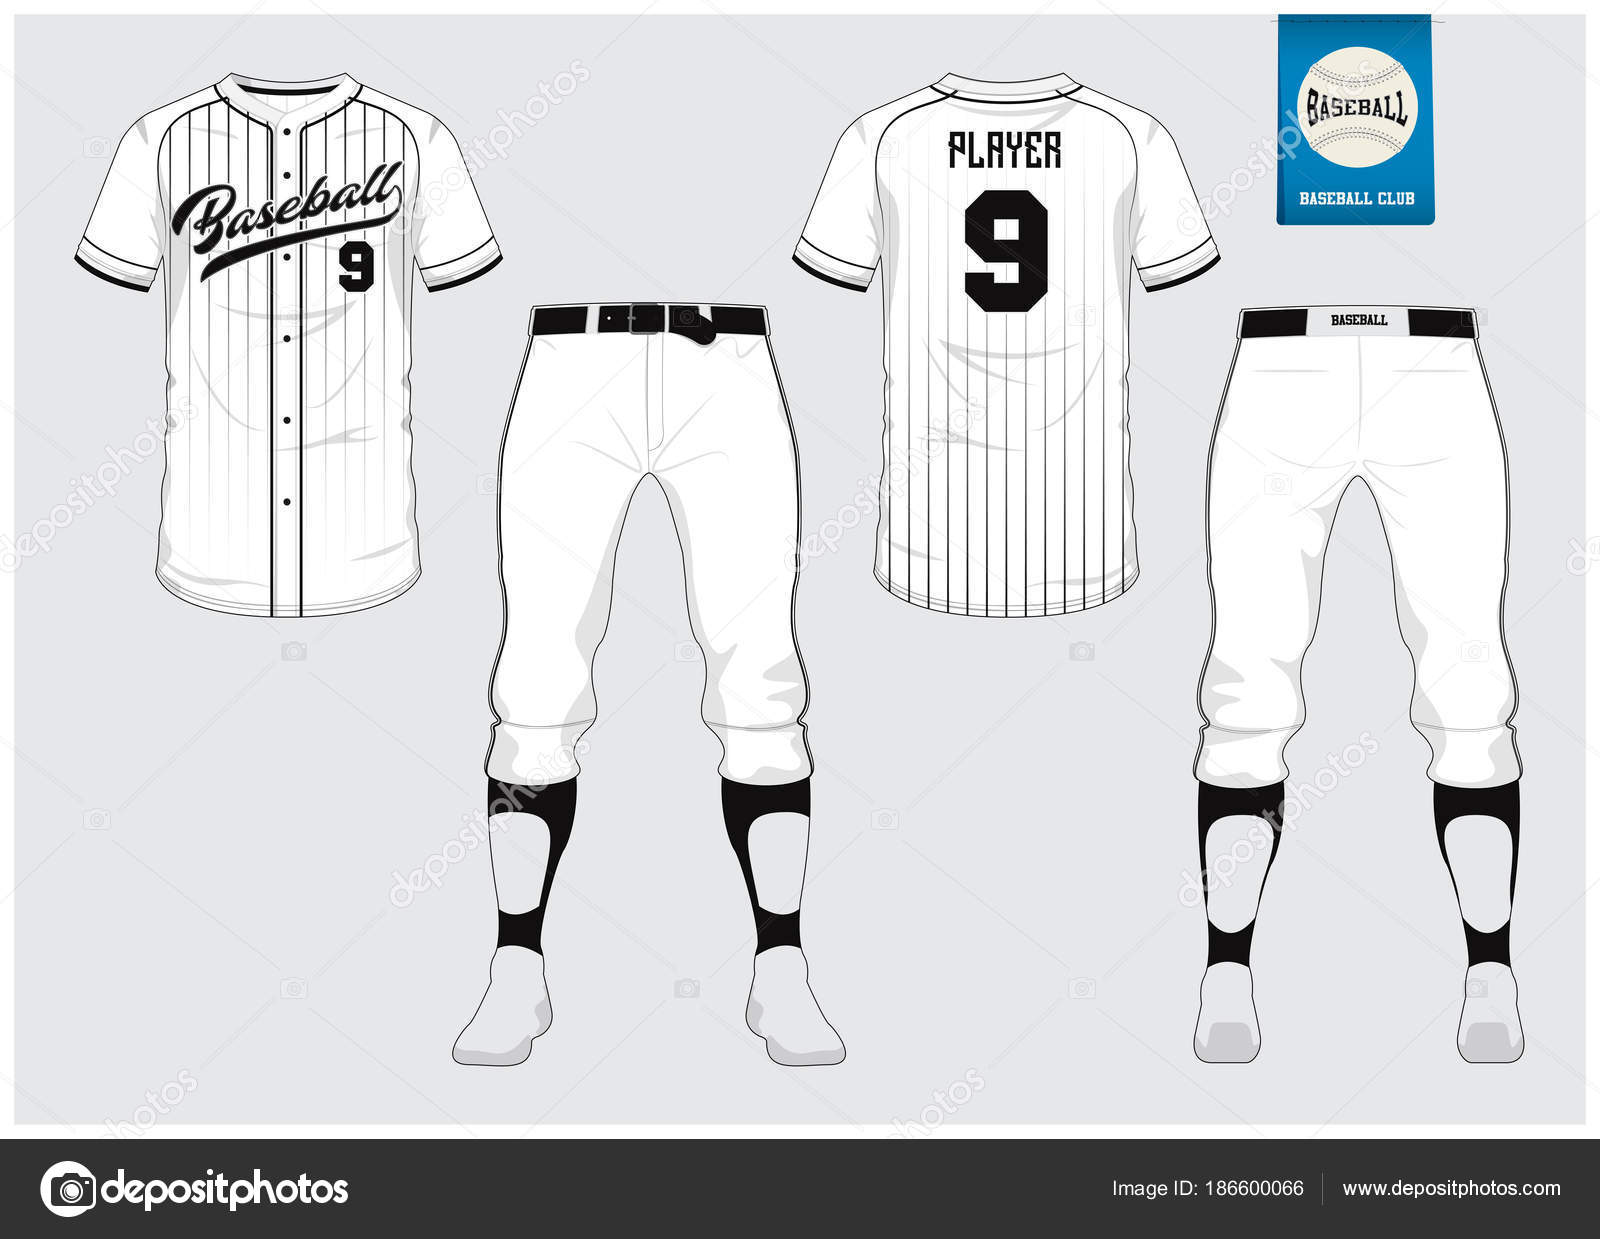 baseball jersey sport uniform raglan t shirt sport short sock template baseball t shirt mock up front and back view baseball uniform flat baseball